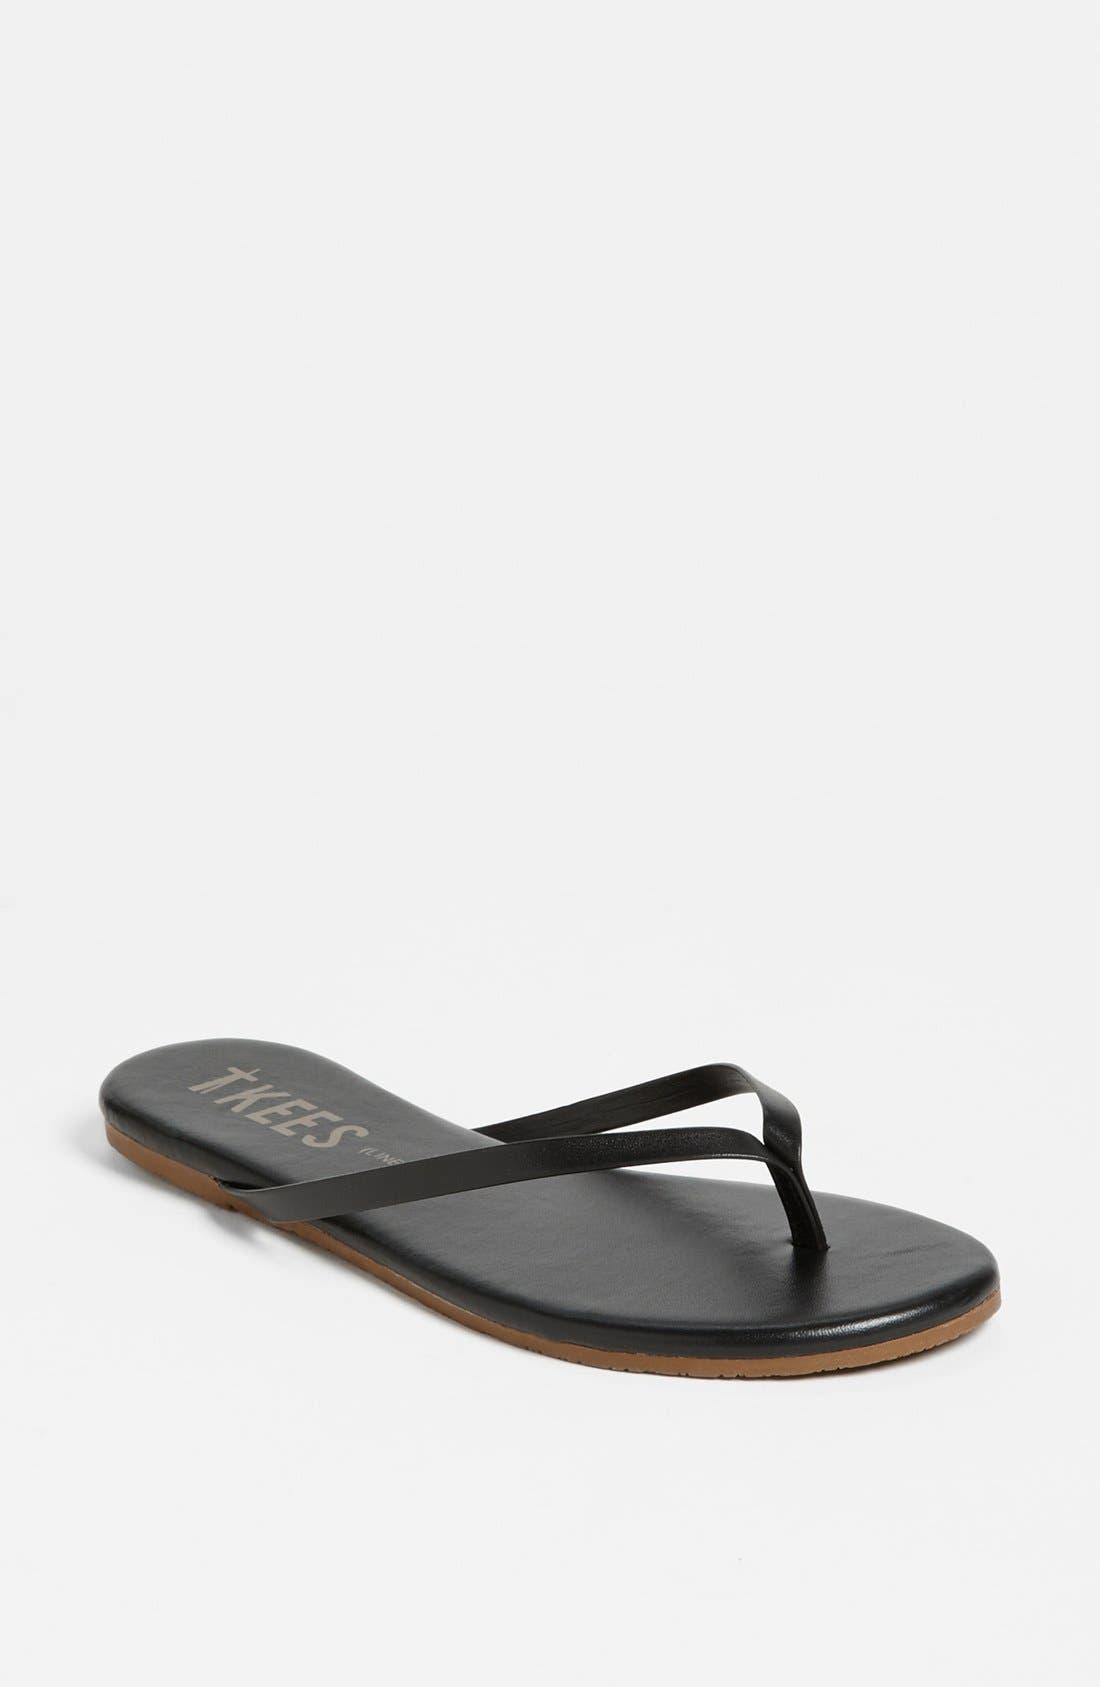 TKEES 'Liners' Flip Flop